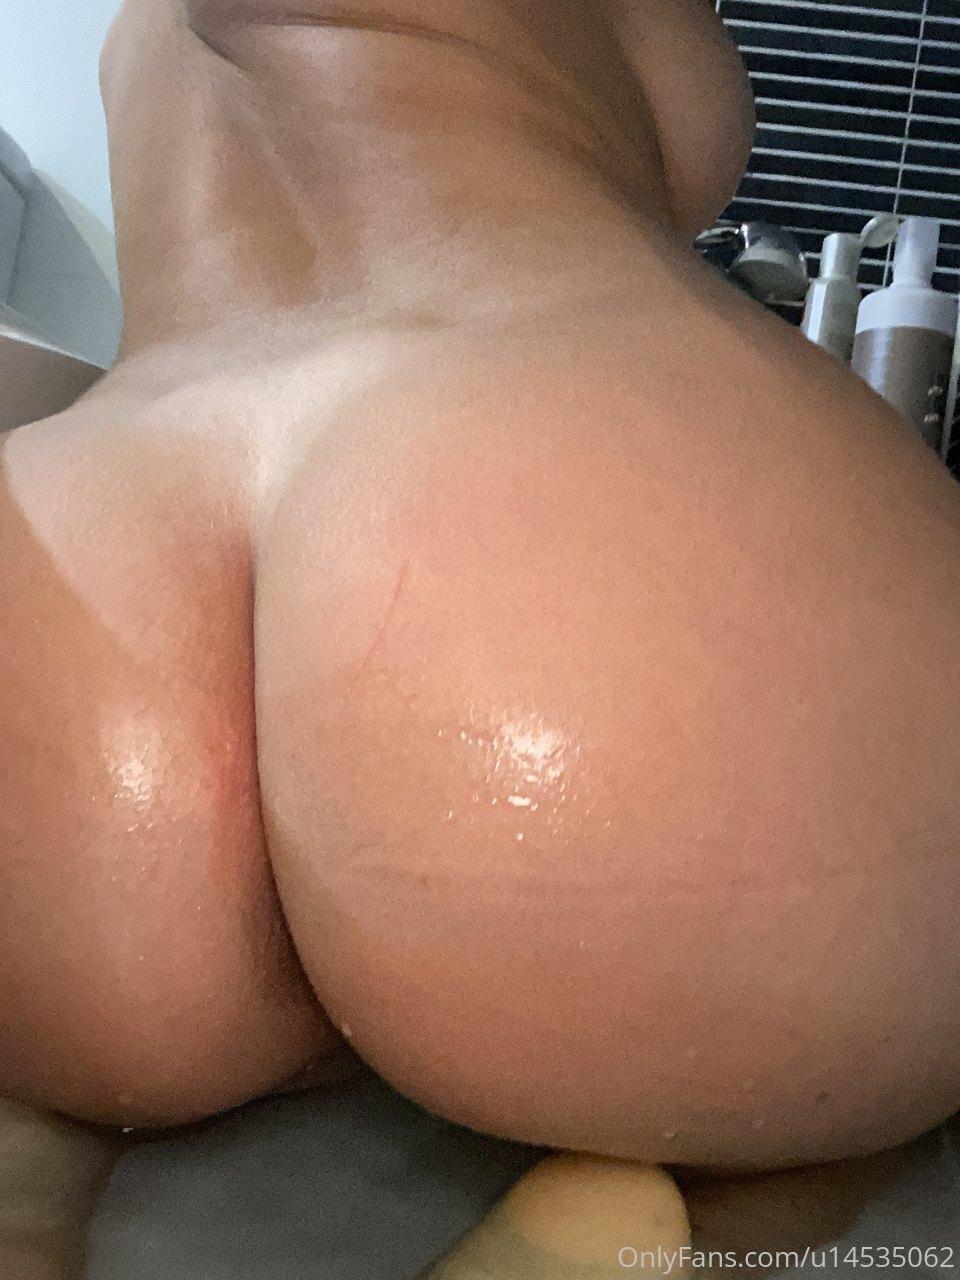 Paola CelebTv onlyfans fotos calientes 9